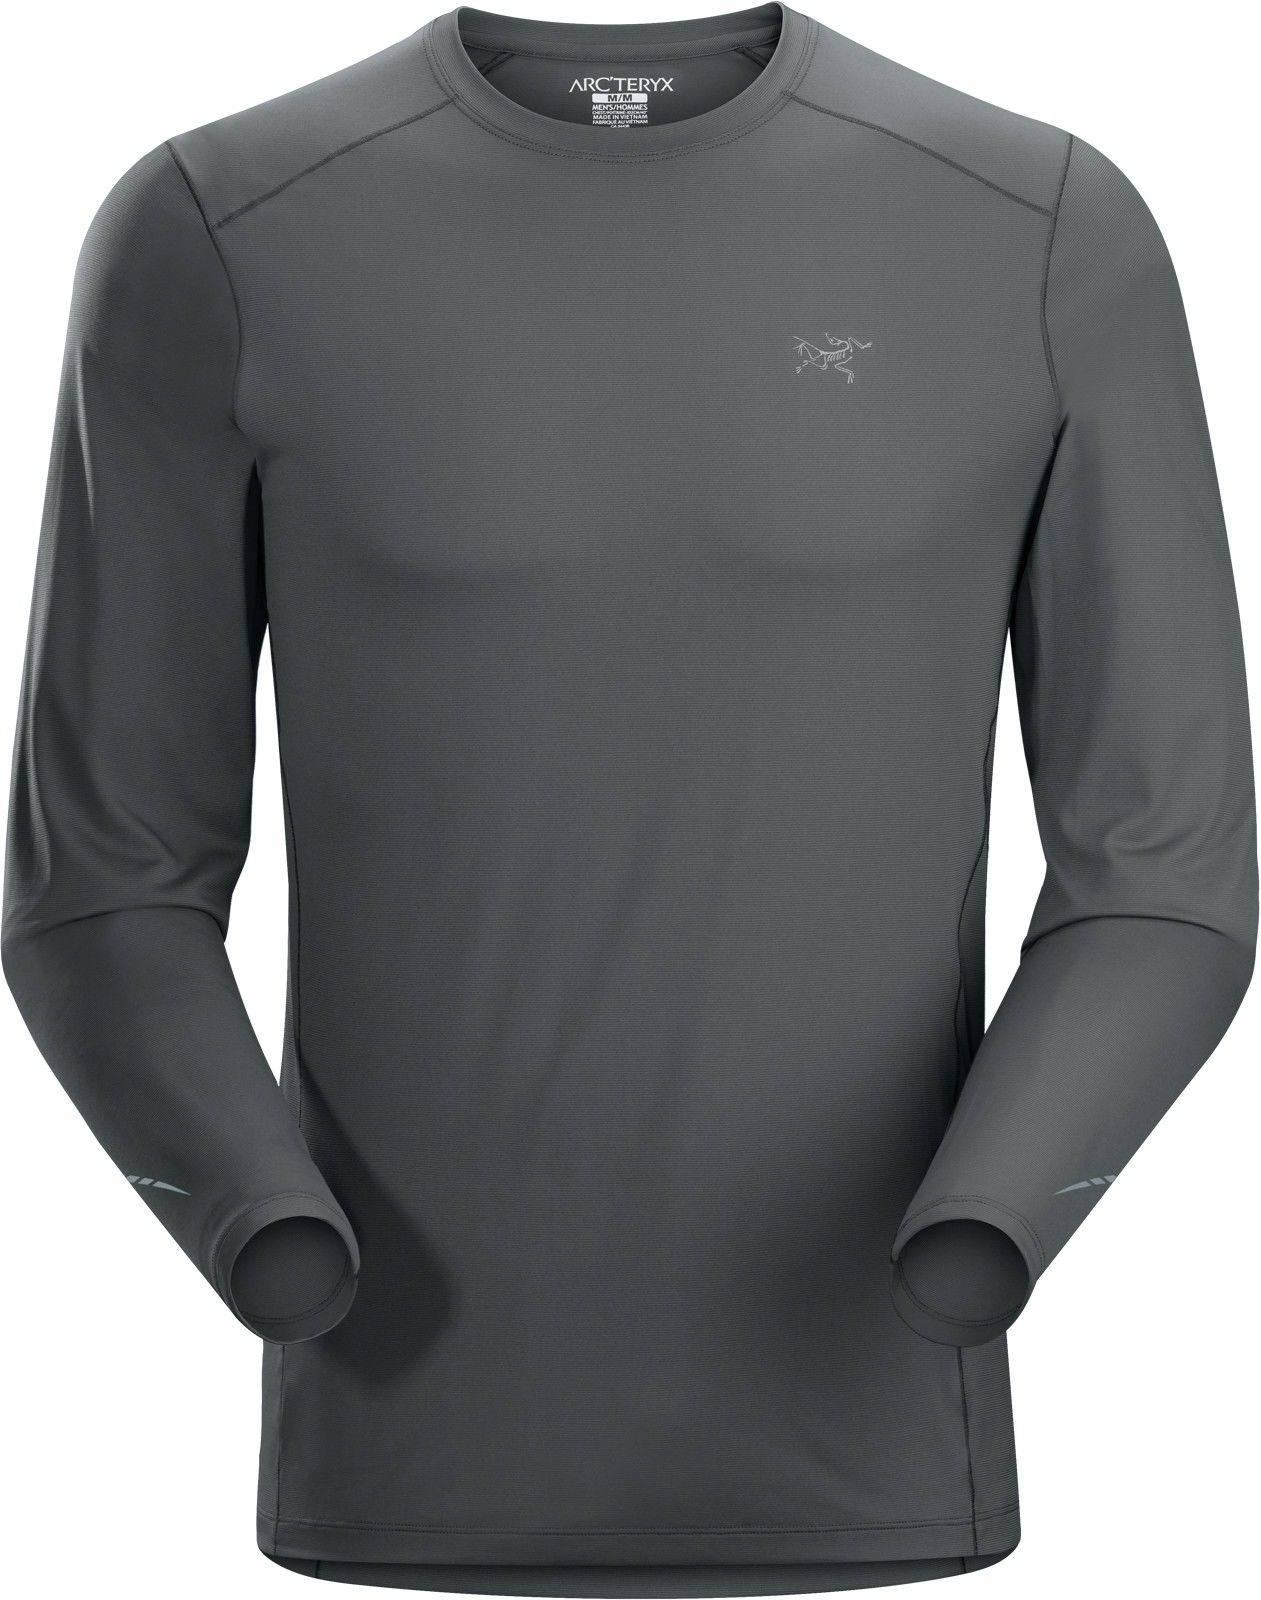 Arcteryx Motus Crew Long-Sleeve Grau, Male Langarm-Shirt, S